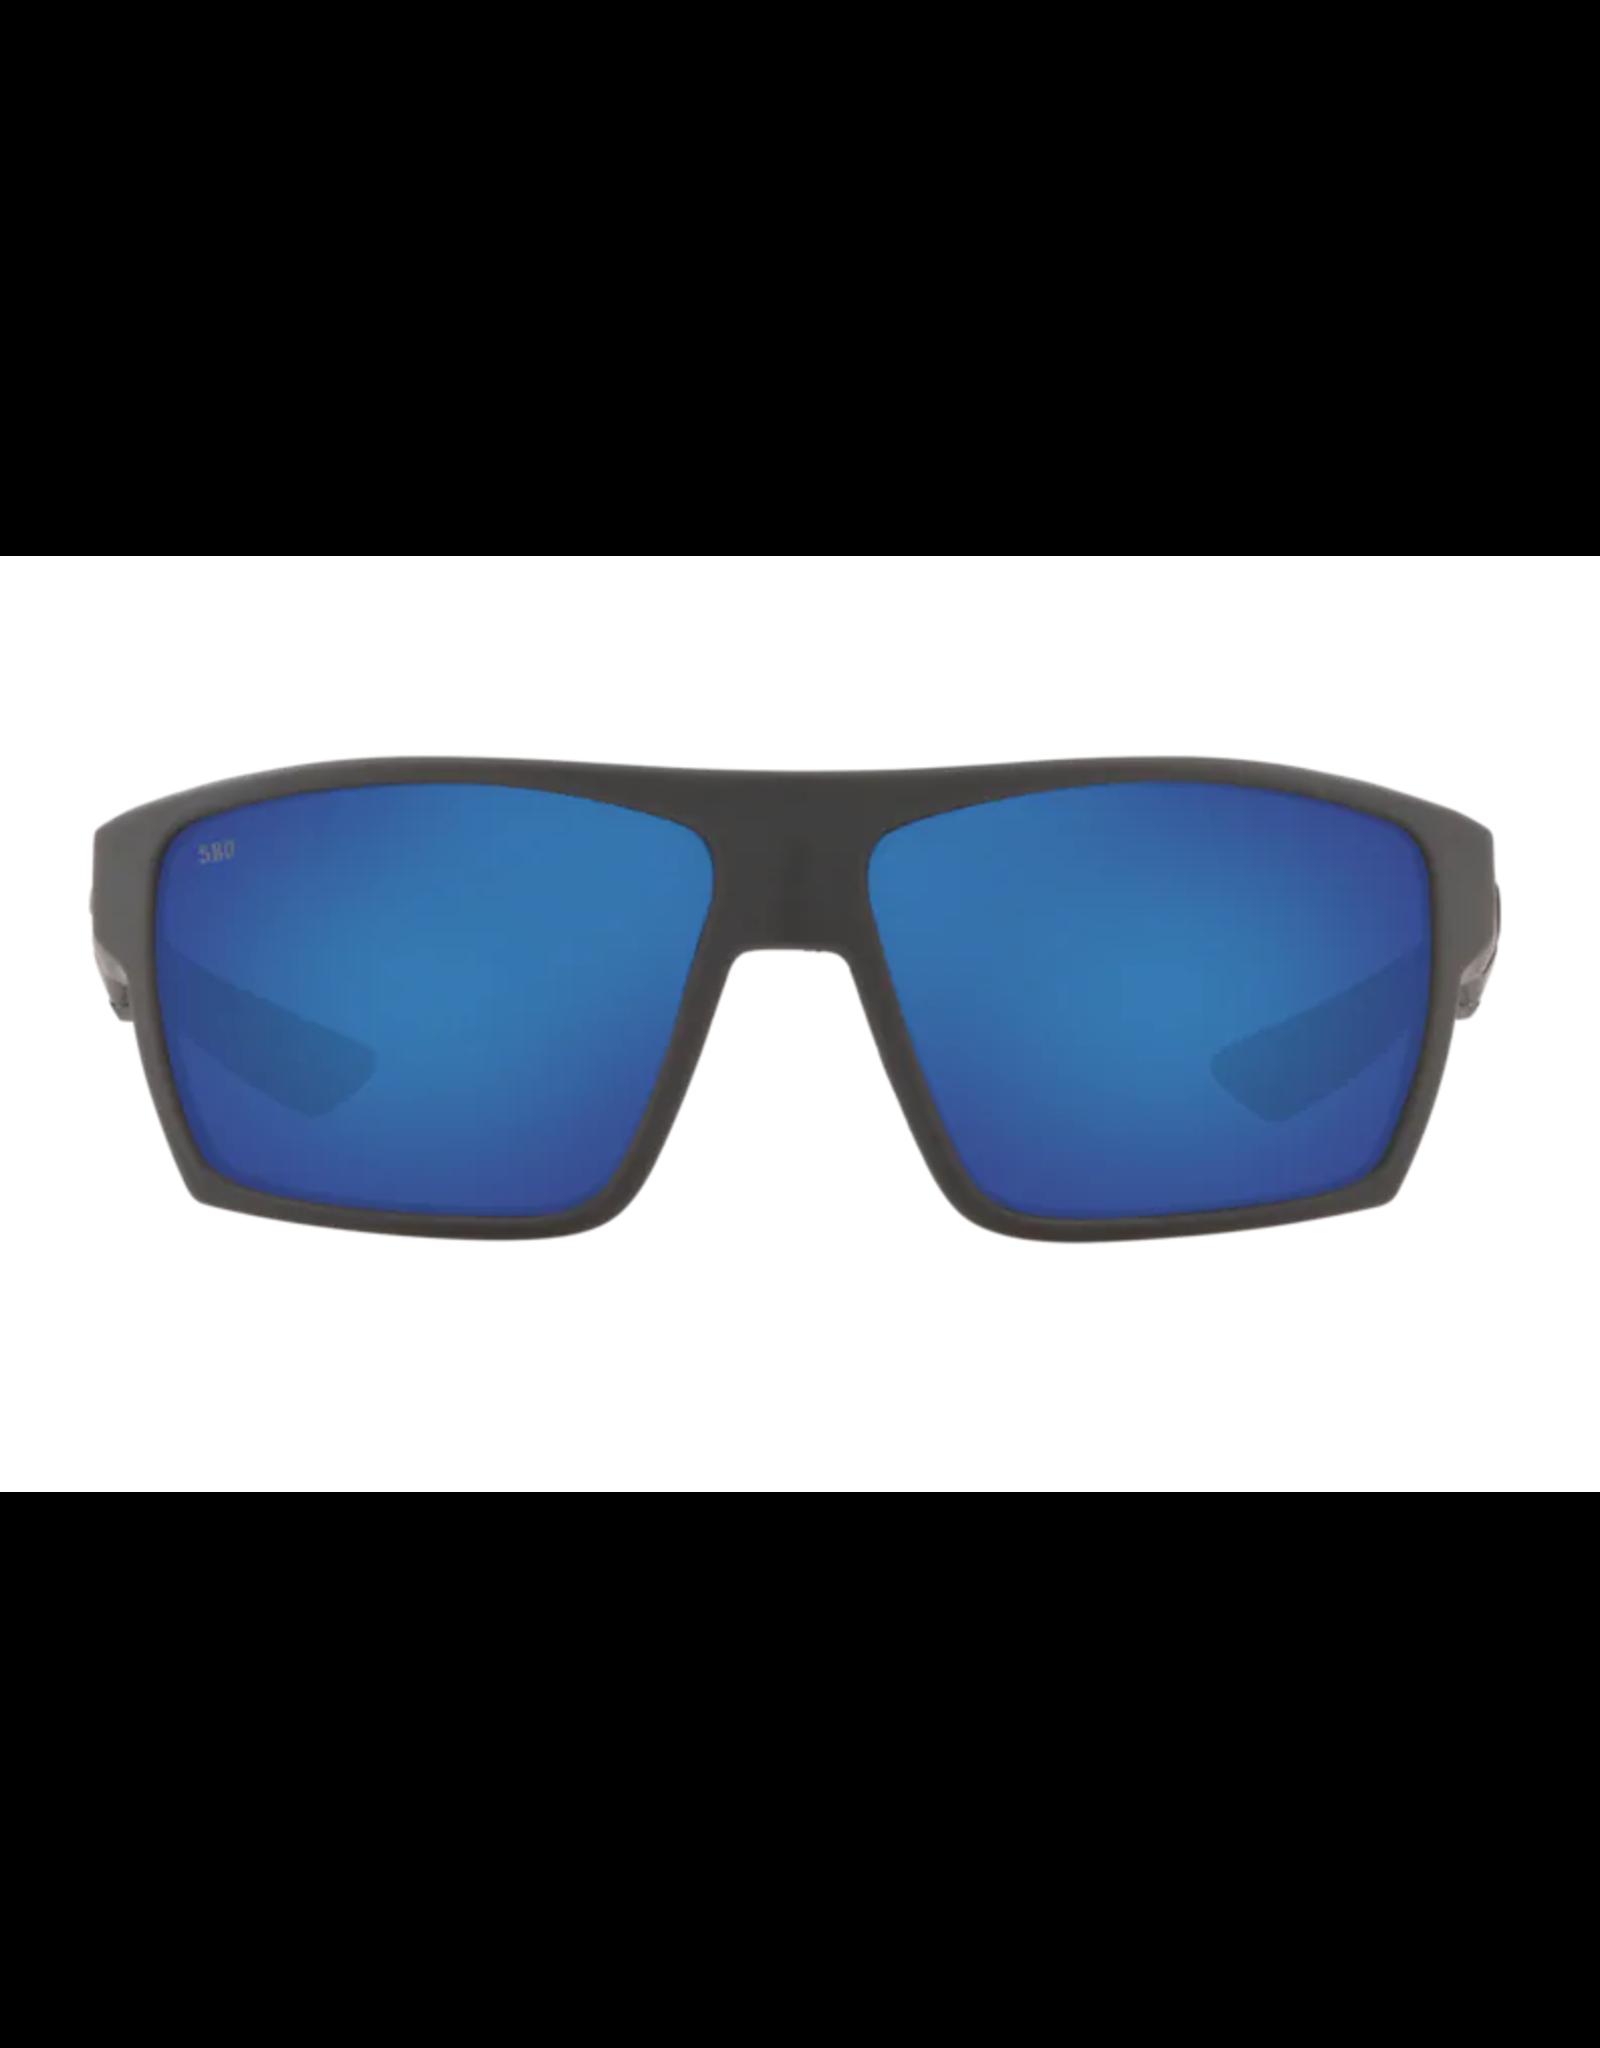 COSTA DEL MAR BLOKE 124 MATTE BLACK MATTE GRAY W/ BLUE MIRROR 580G